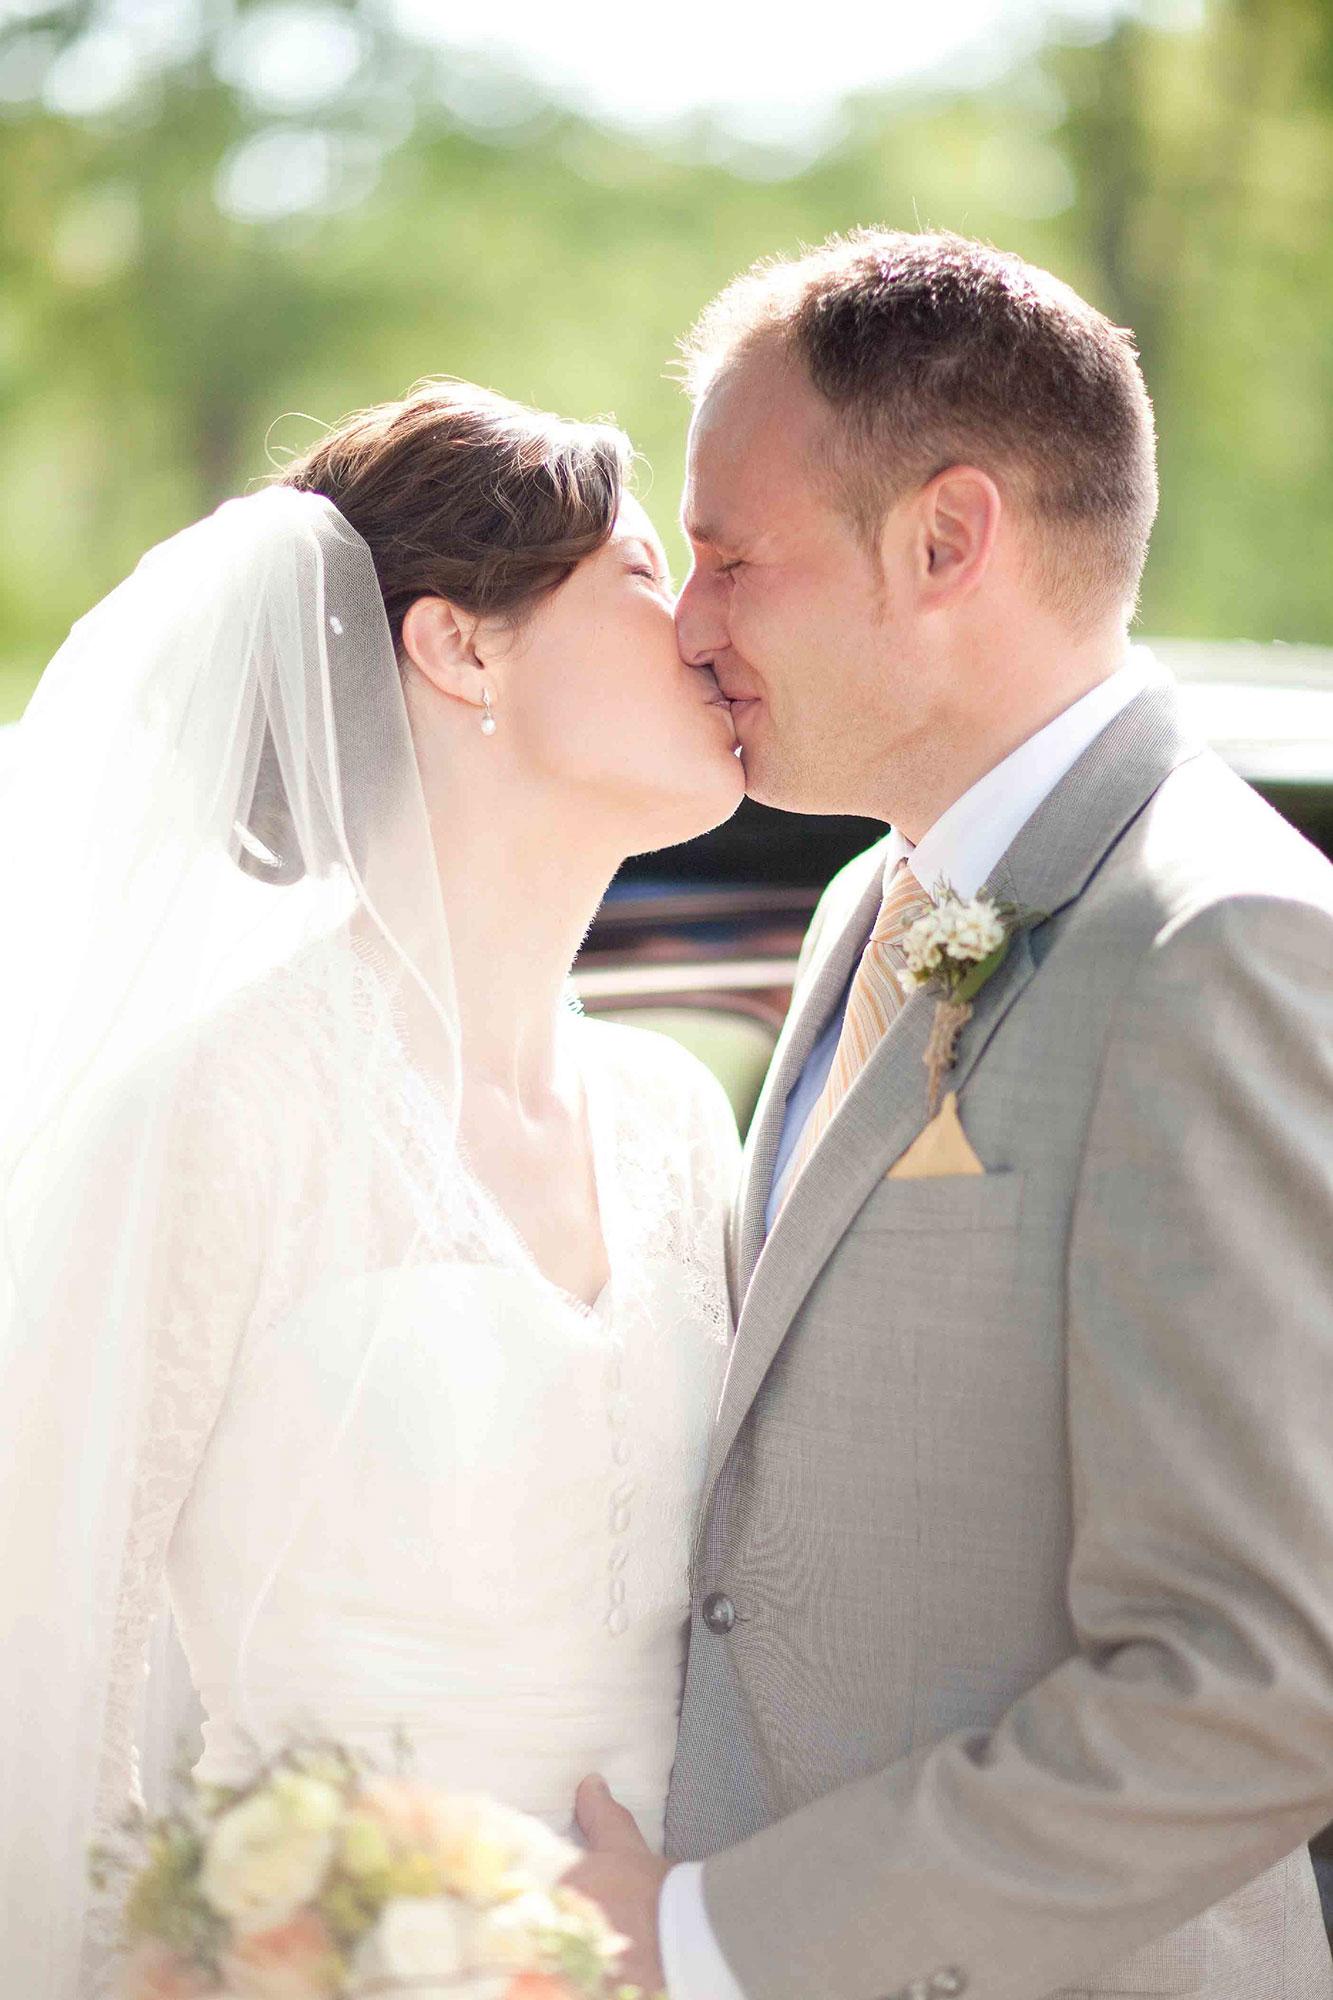 Amanda-Cowley-Willowbank-Vineyard-Bride-Photo-By-White-Photographie-016.jpg